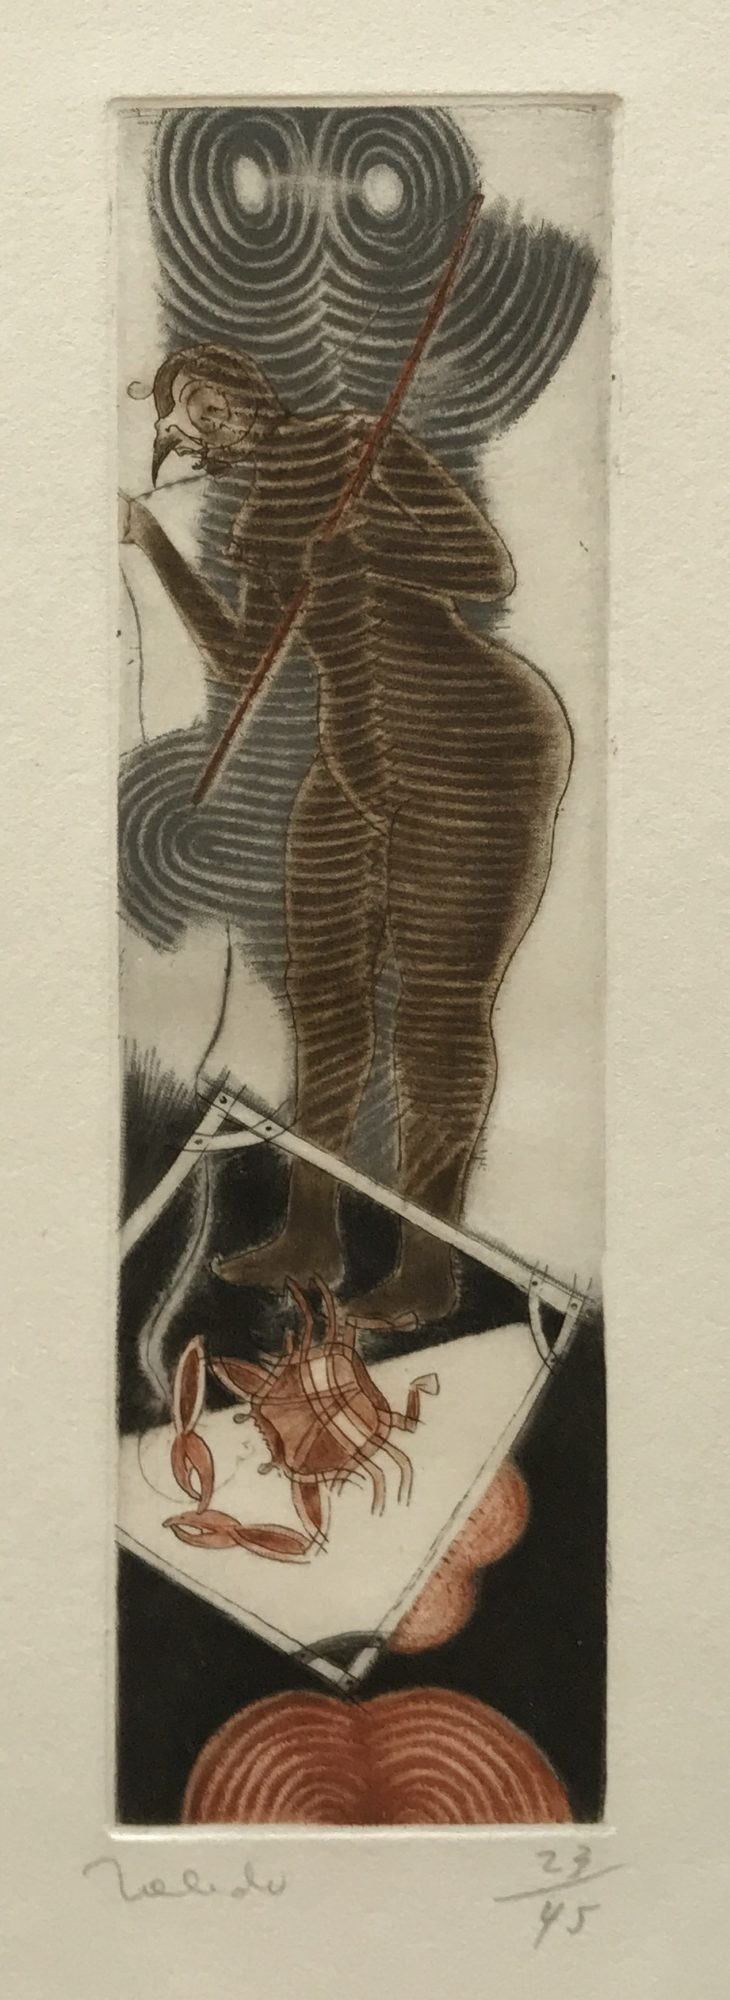 Francisco Toledo - Bird Woman with Crab